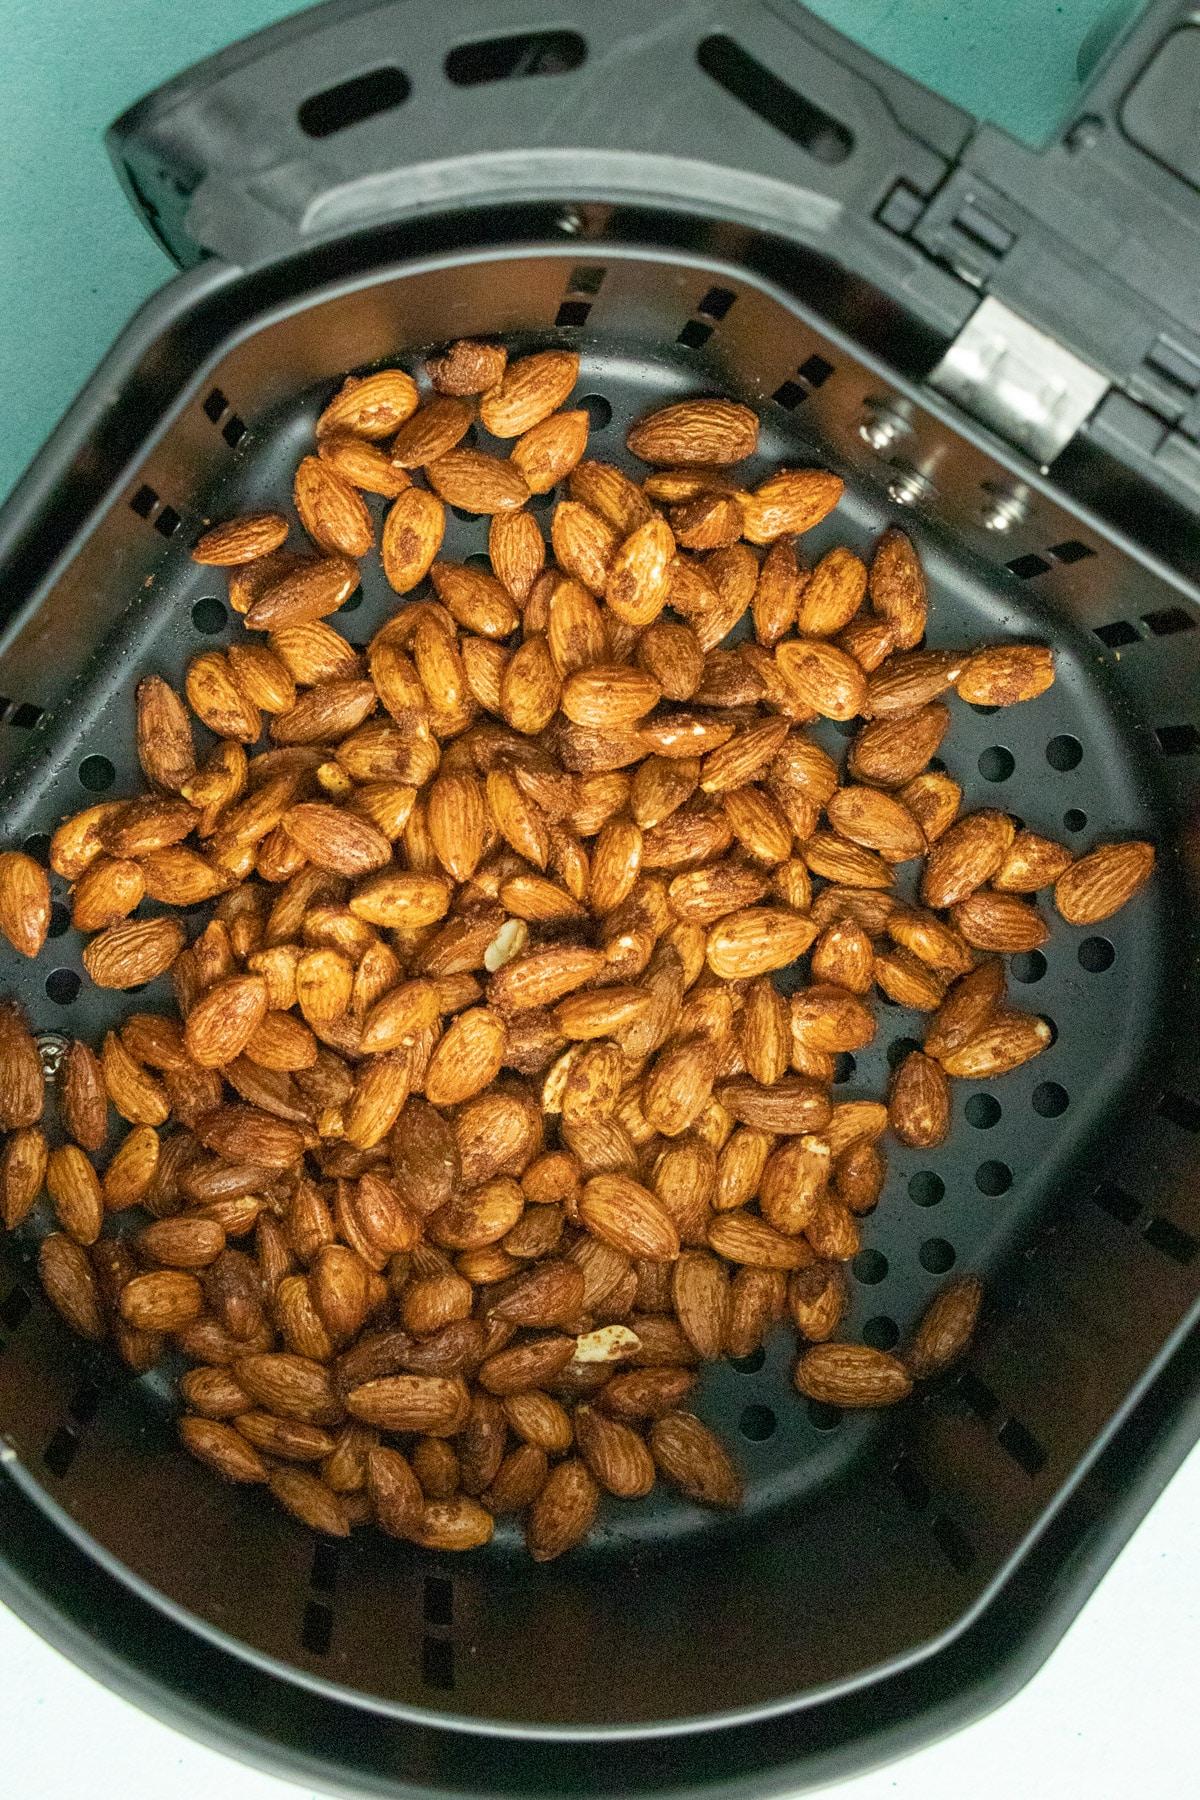 uncooked garlic almonds in the air fryer basket